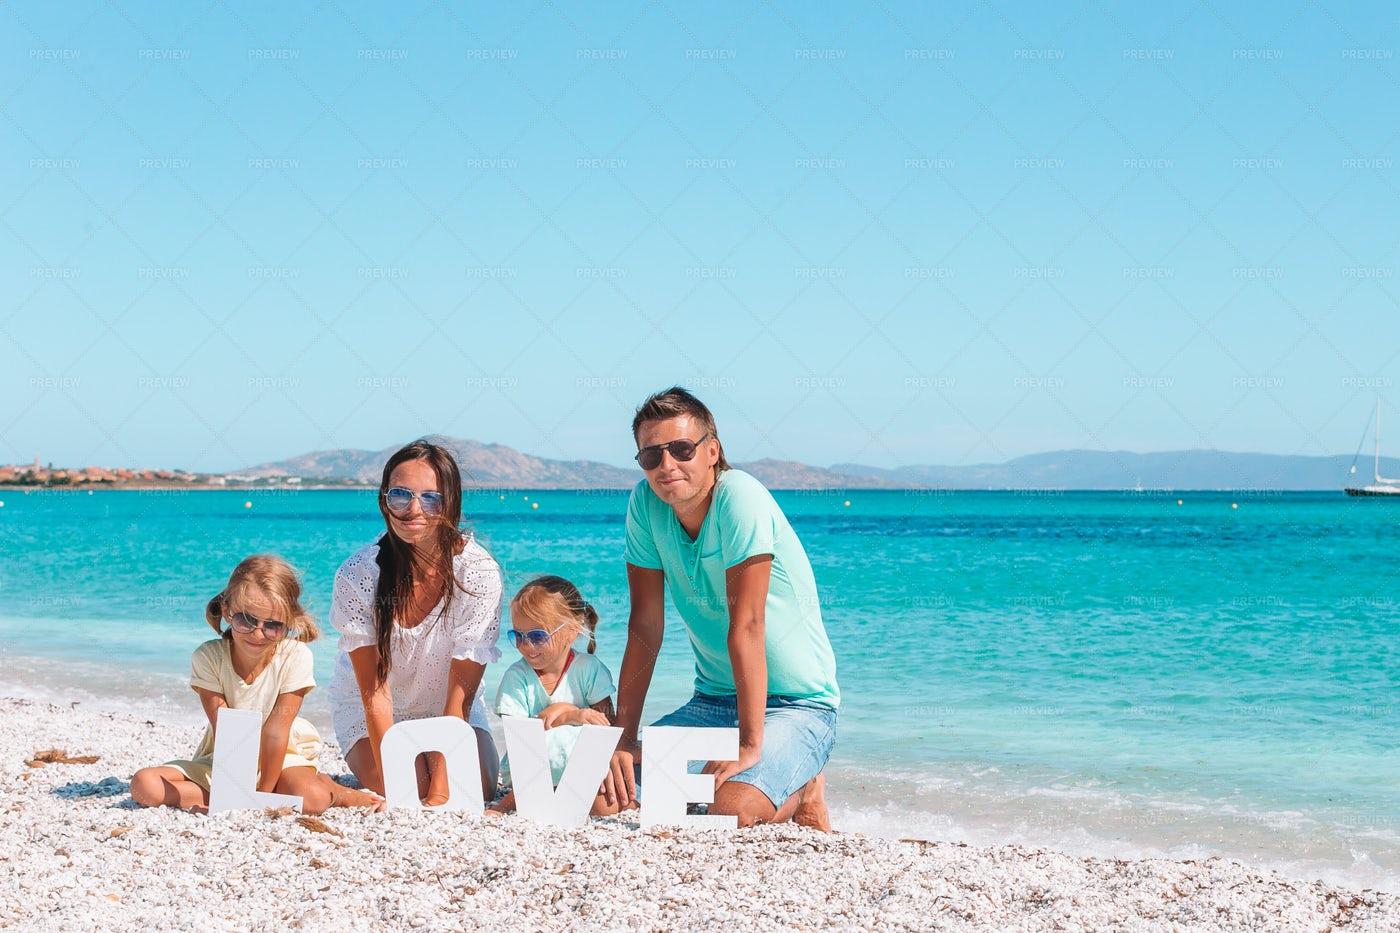 Family With Love Sign On Beach: Stock Photos